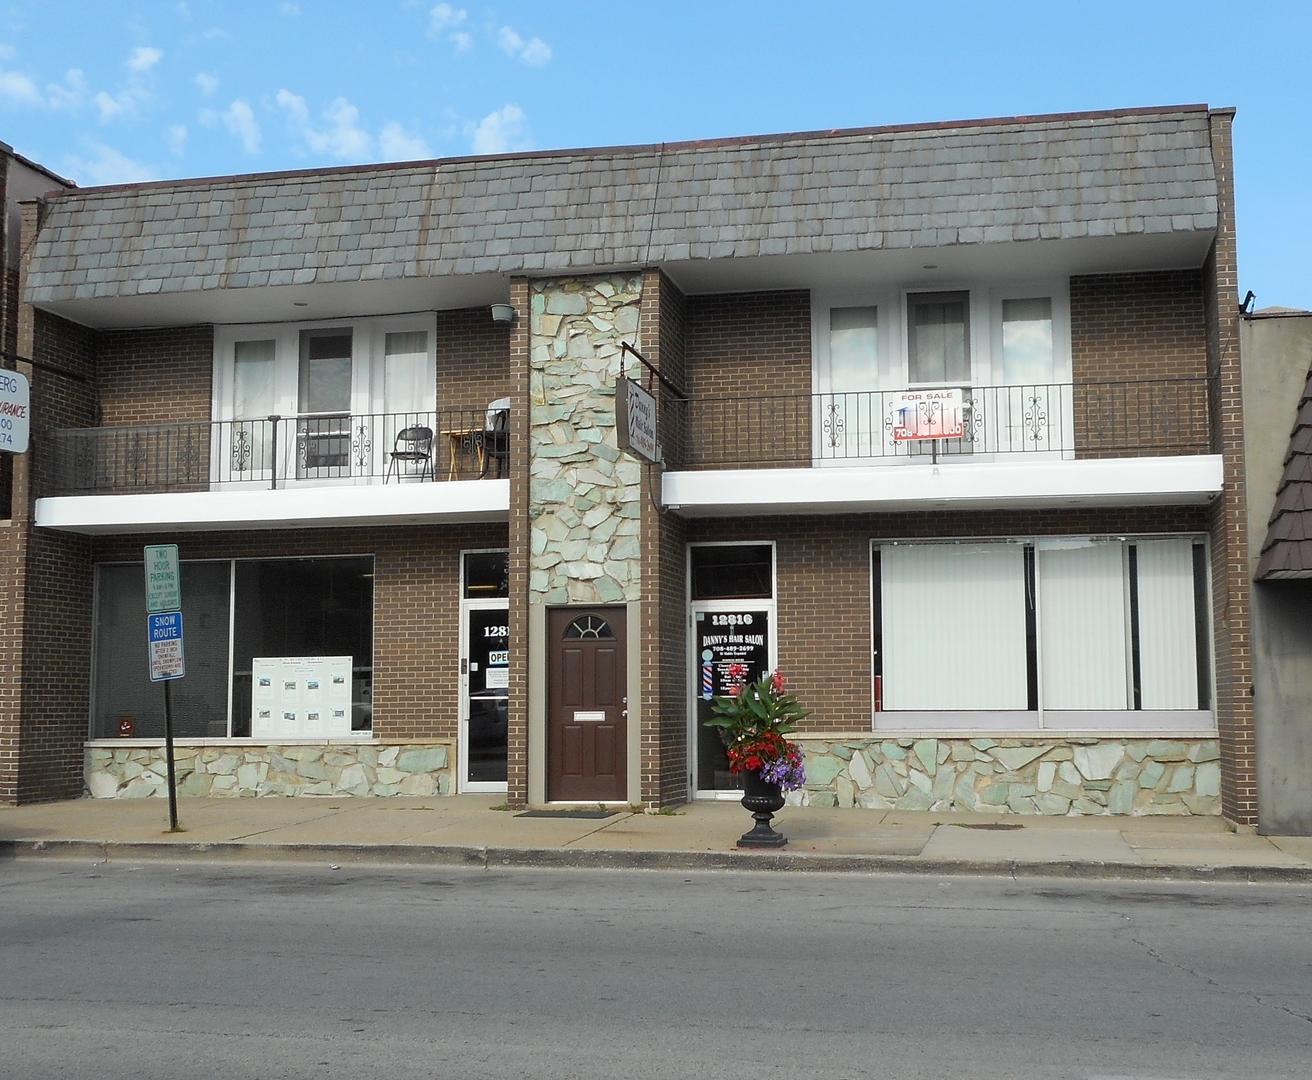 12816 Western ,Blue Island, Illinois 60406